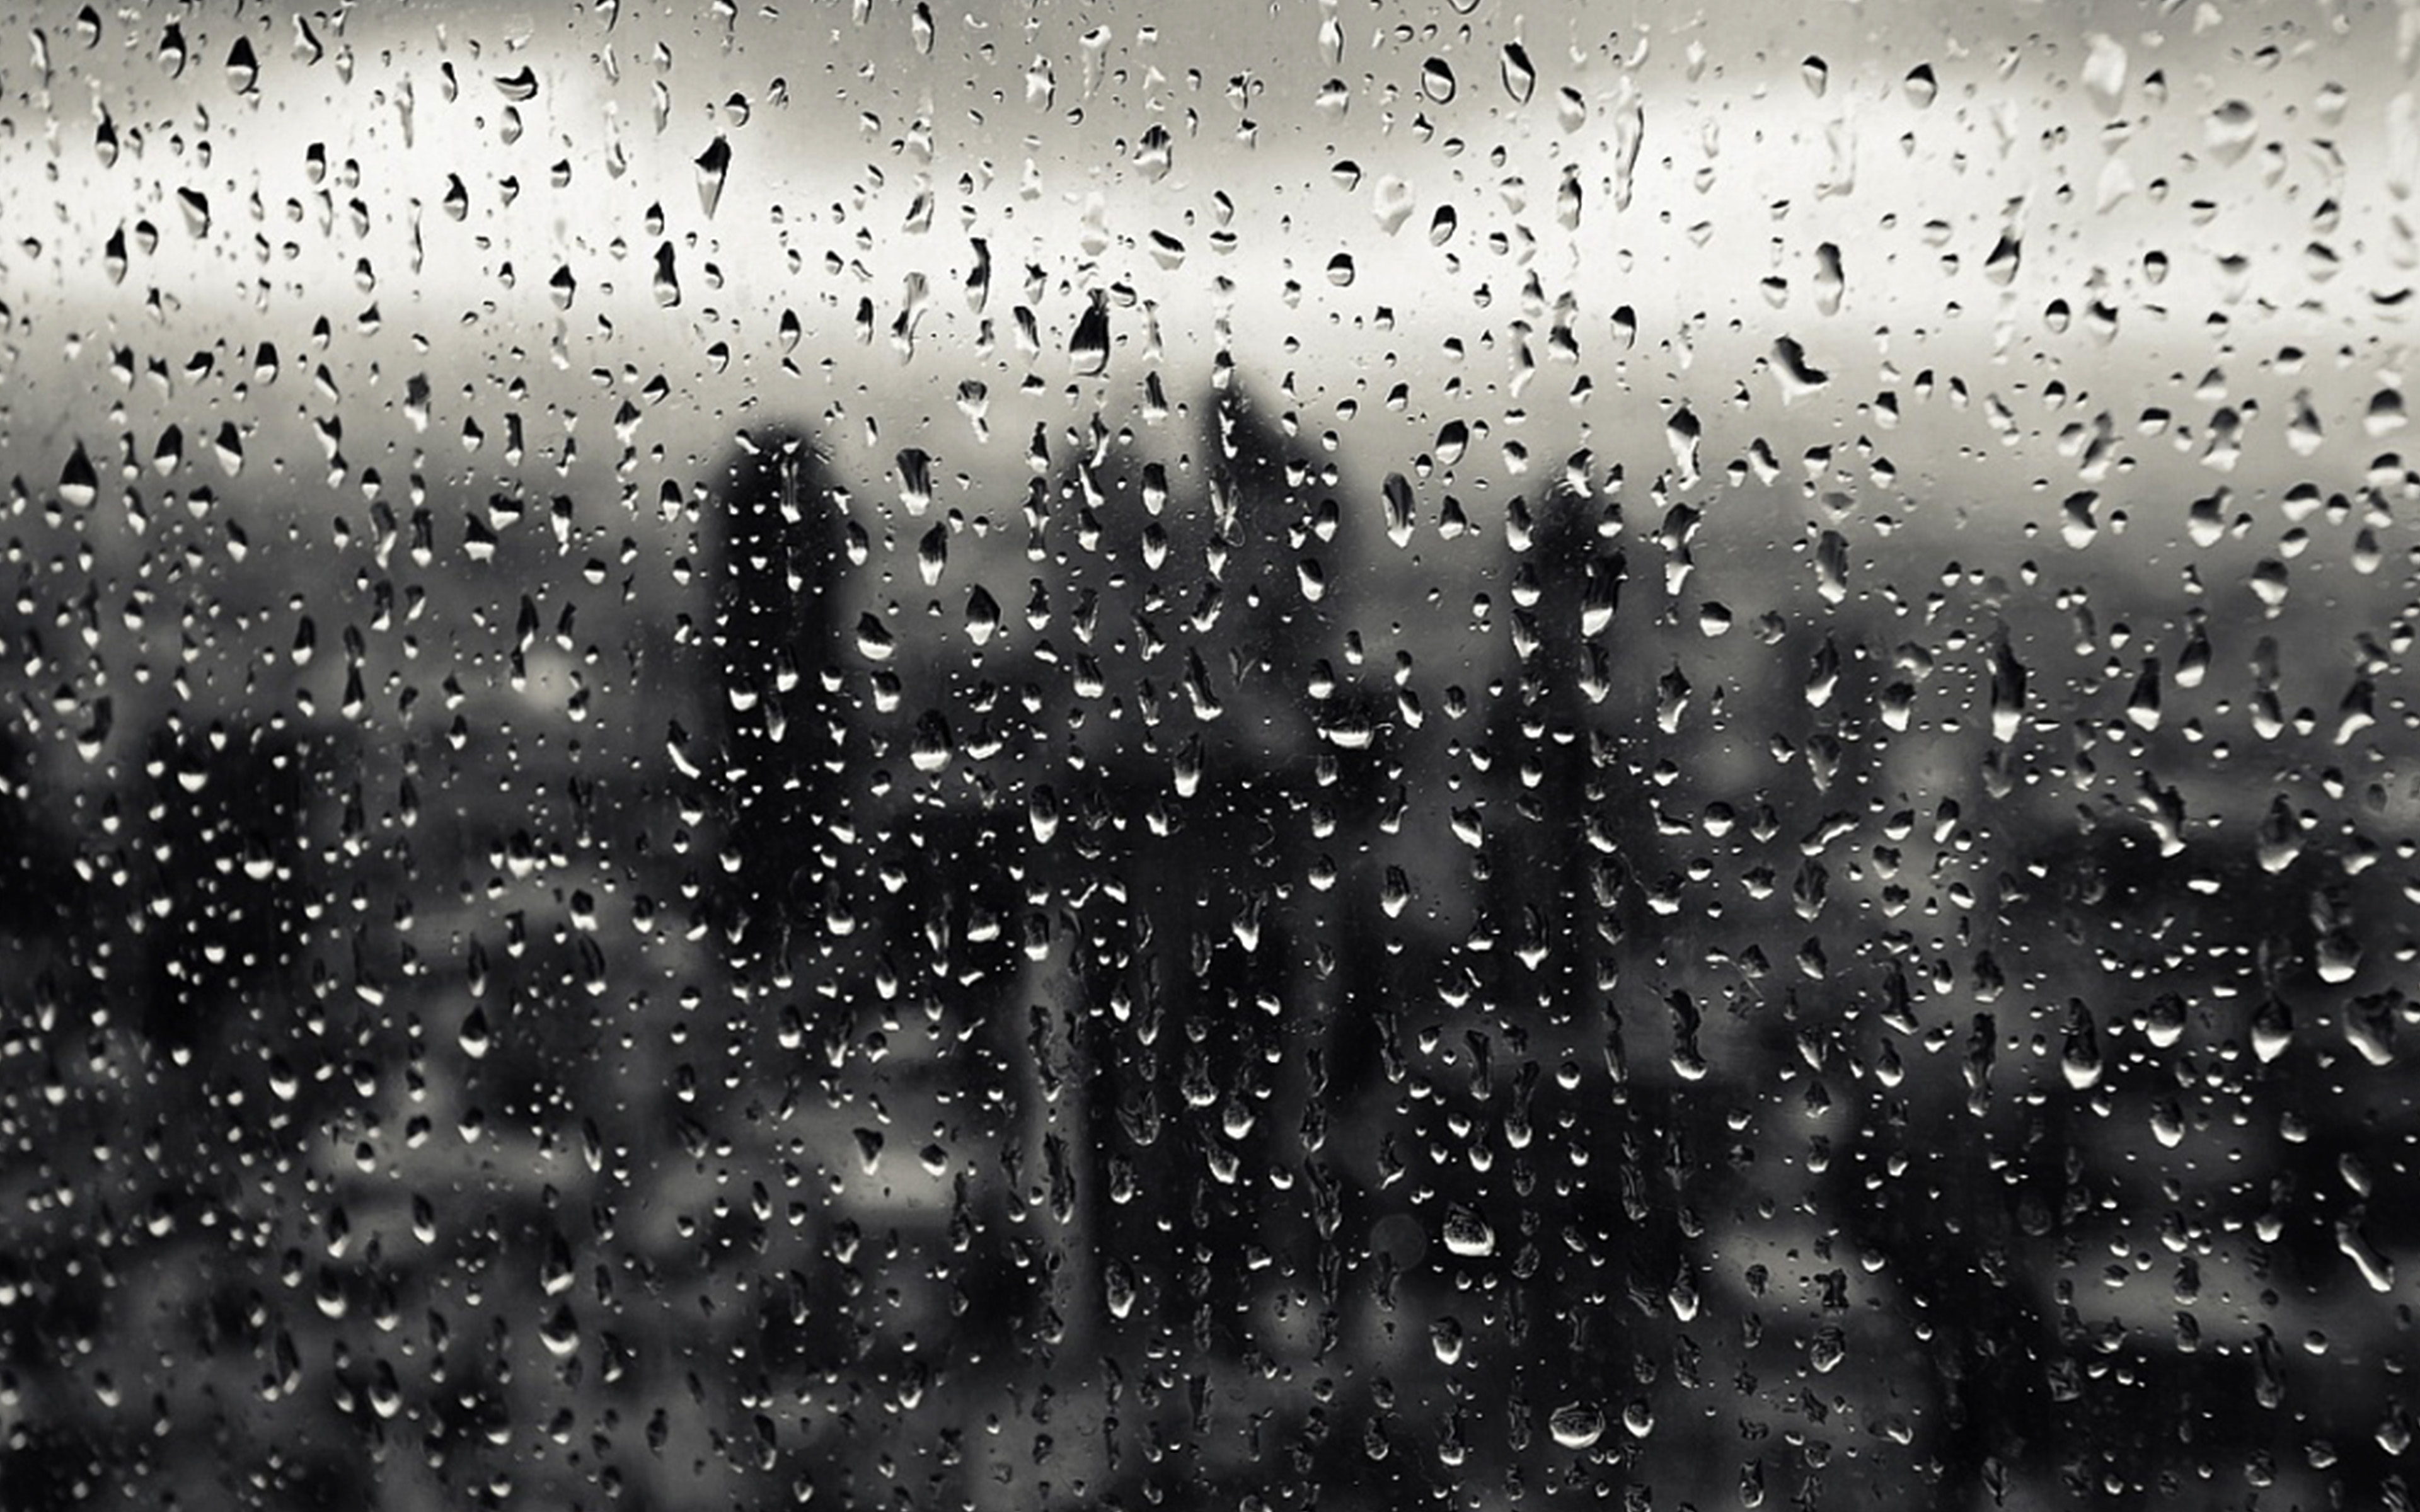 Must see Wallpaper Macbook Rain - papers  Photograph_202955.jpg